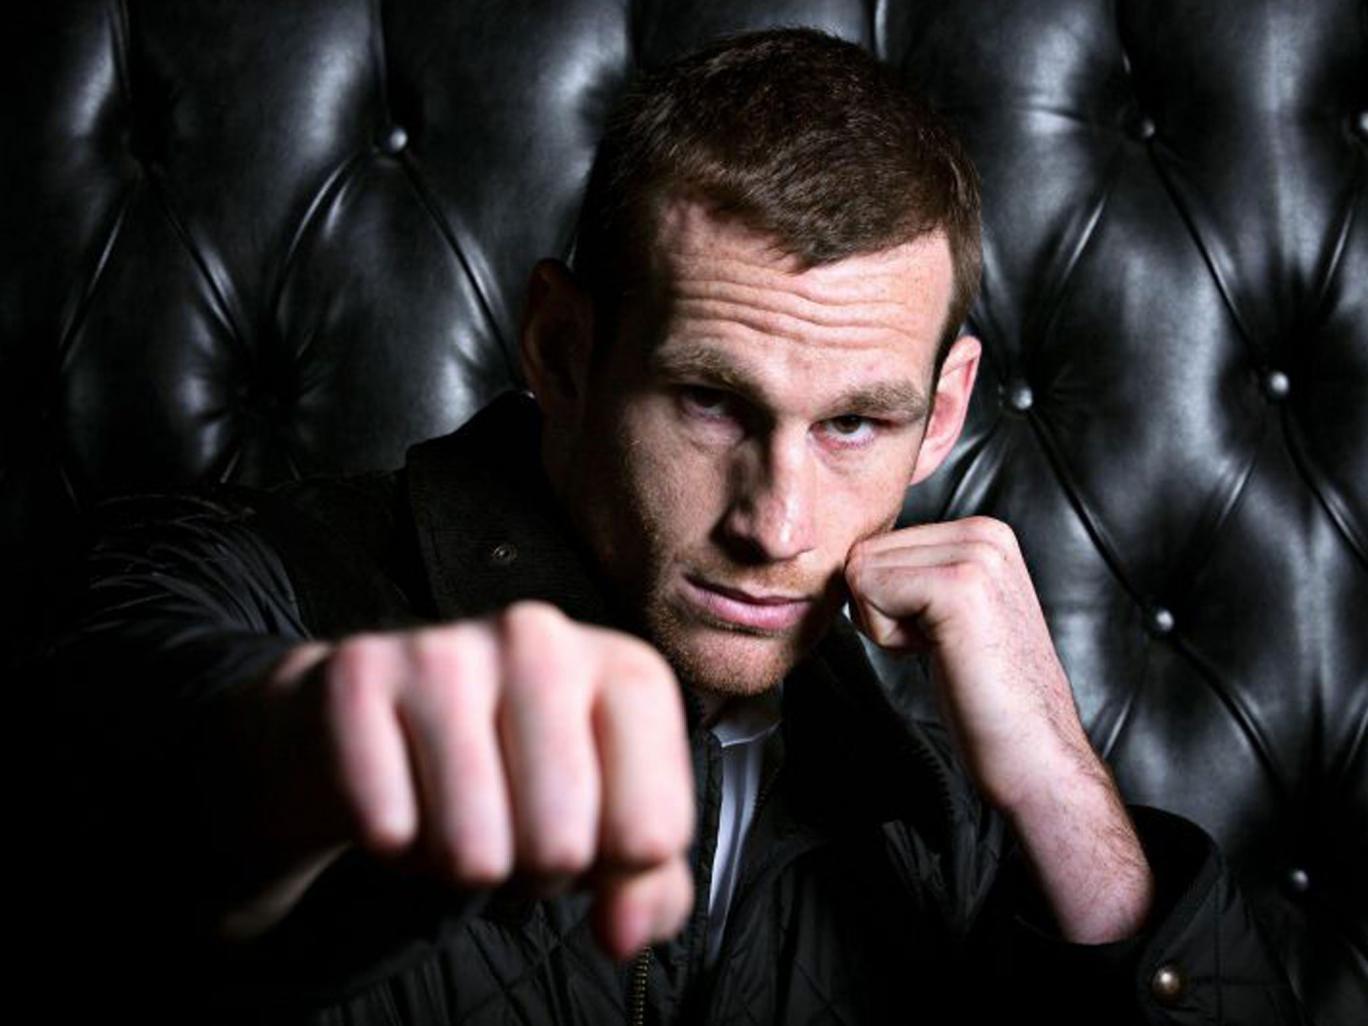 David Price, the British heavyweight champion, has won all of his 15 pro fights